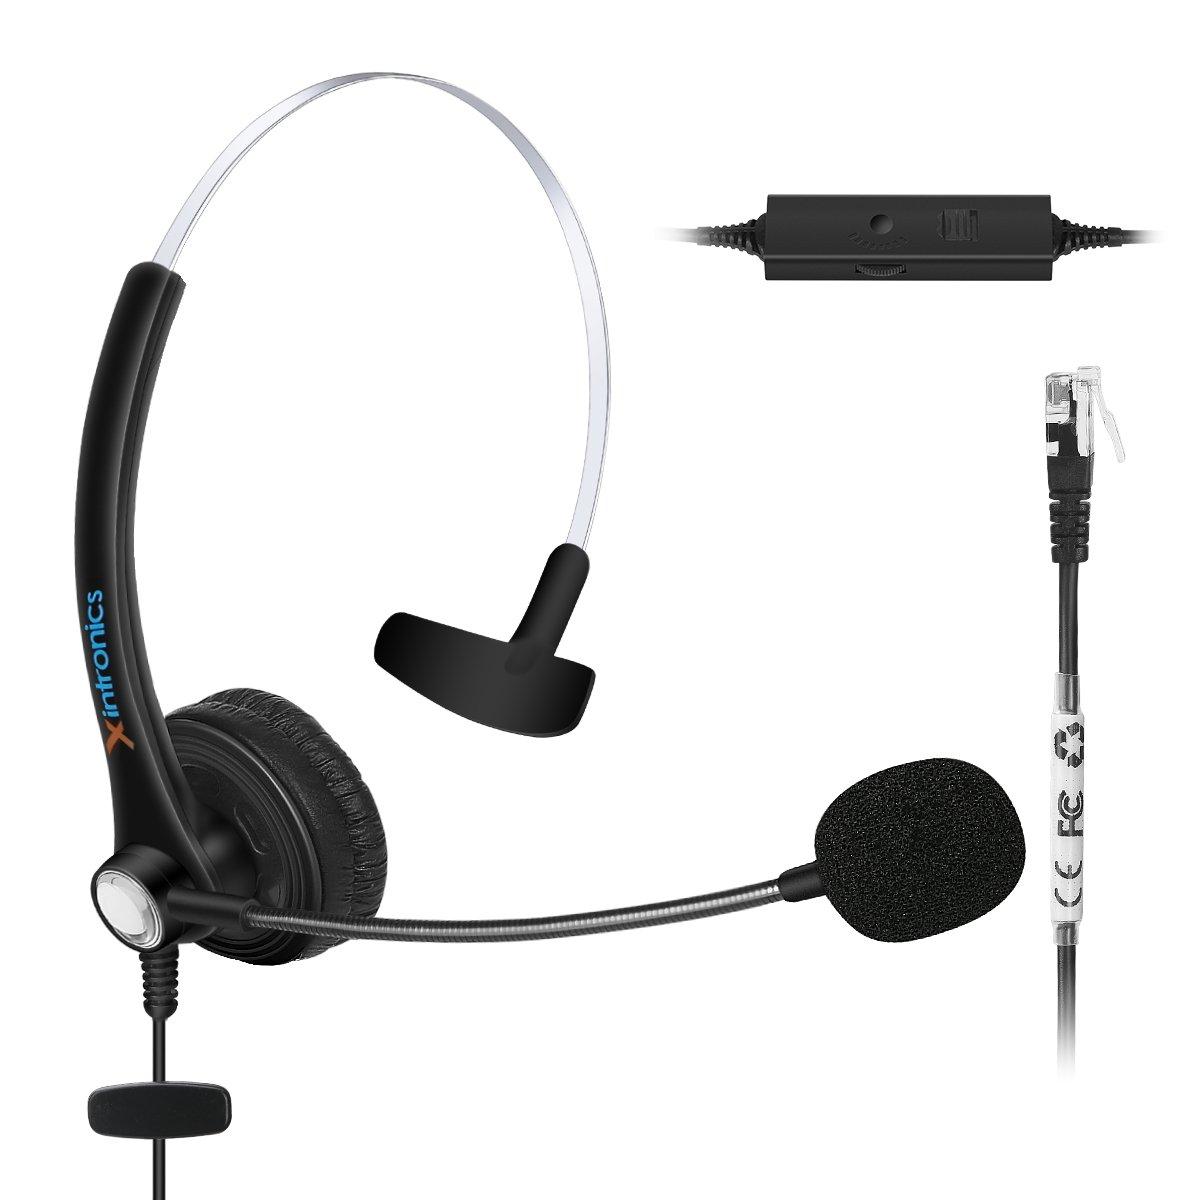 Xintronics RJ9 headset for Nortel Networks Nothern Telecom Meridian PBX Norstar M7208 M7310 M7324 T7208 T7316 M7900 Nec Electra Elite DTU DPT Series E Mitel Siemens Rolm Polycom Toshiba Avaya IP Phone